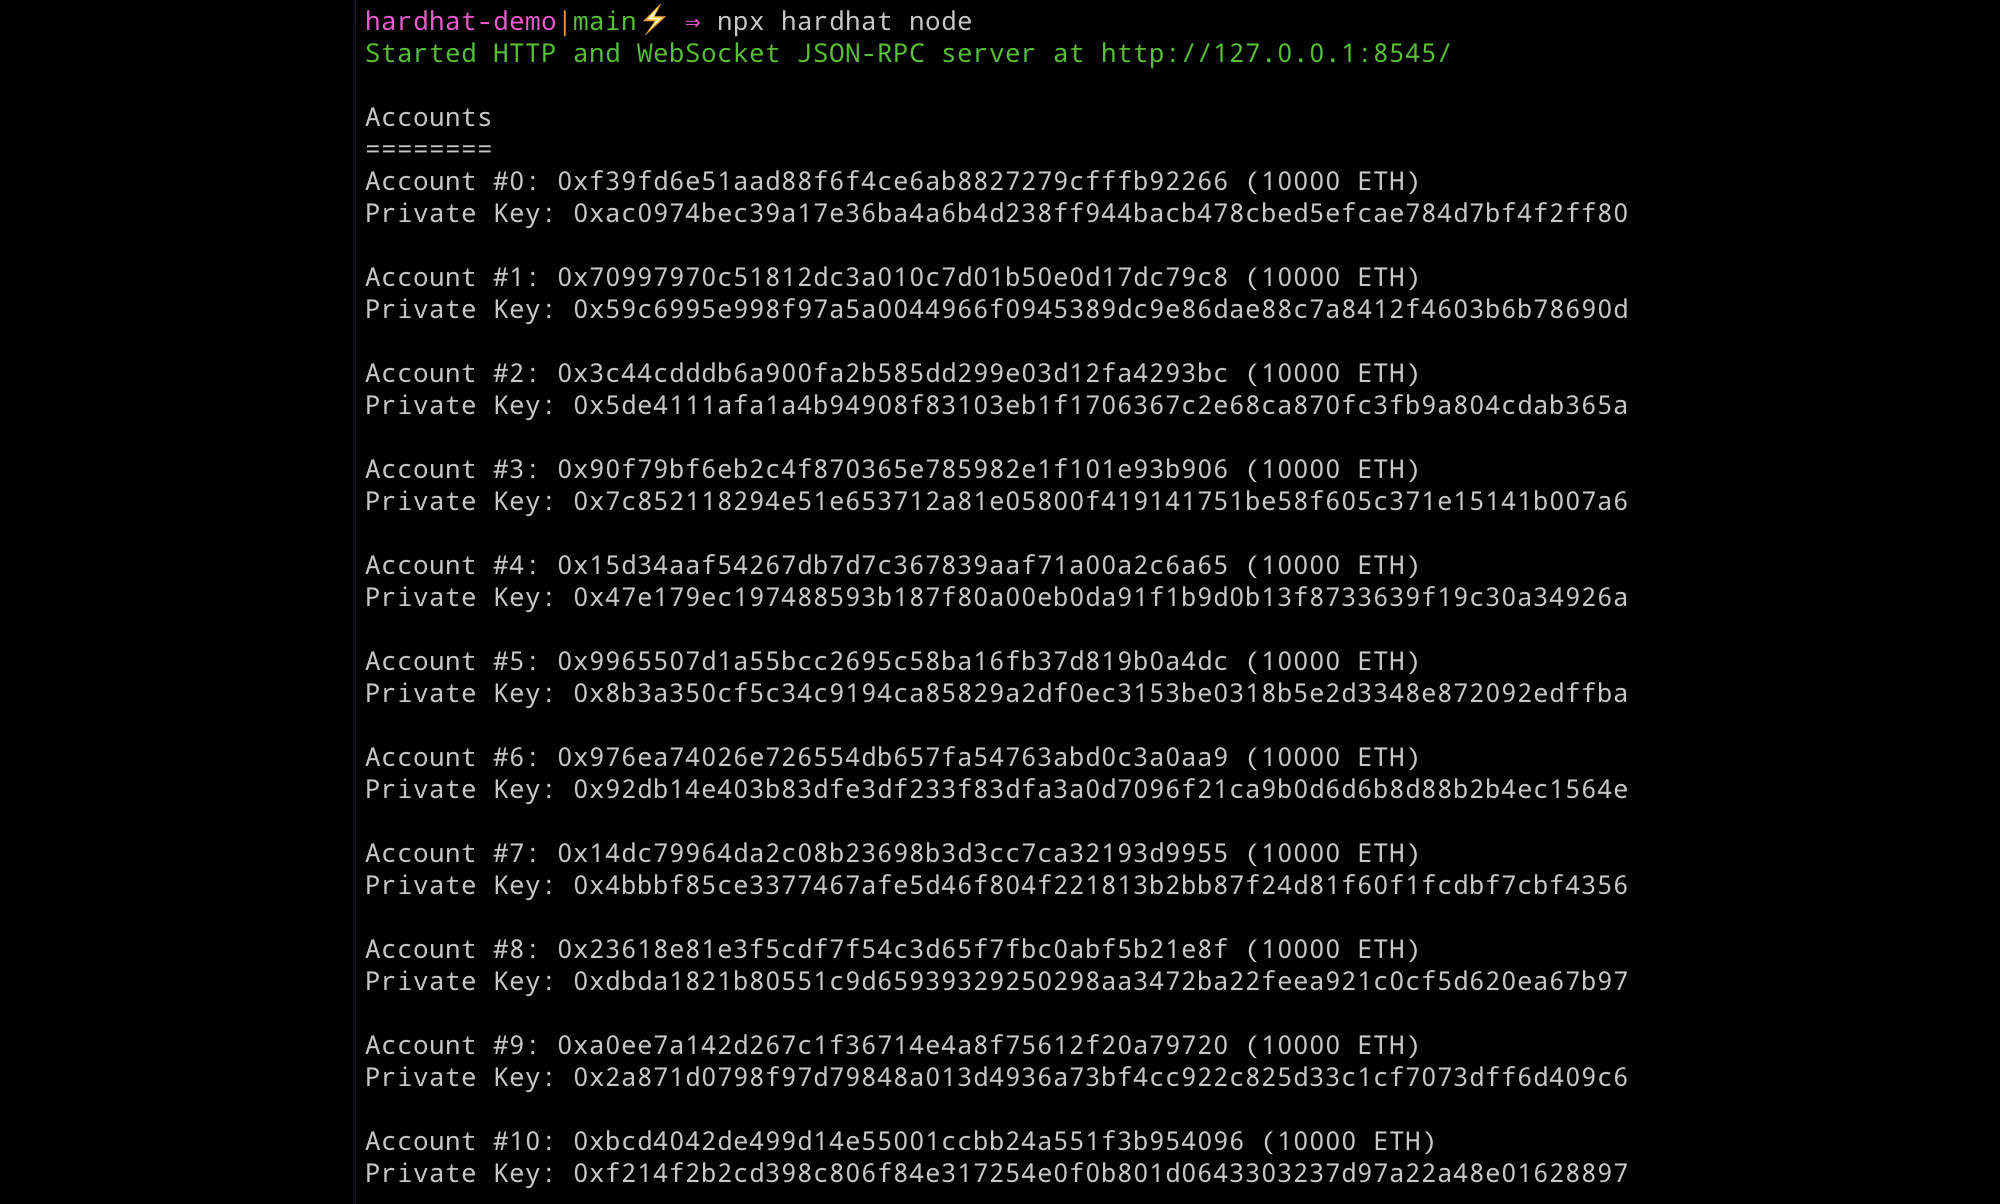 Hardhat node addresses